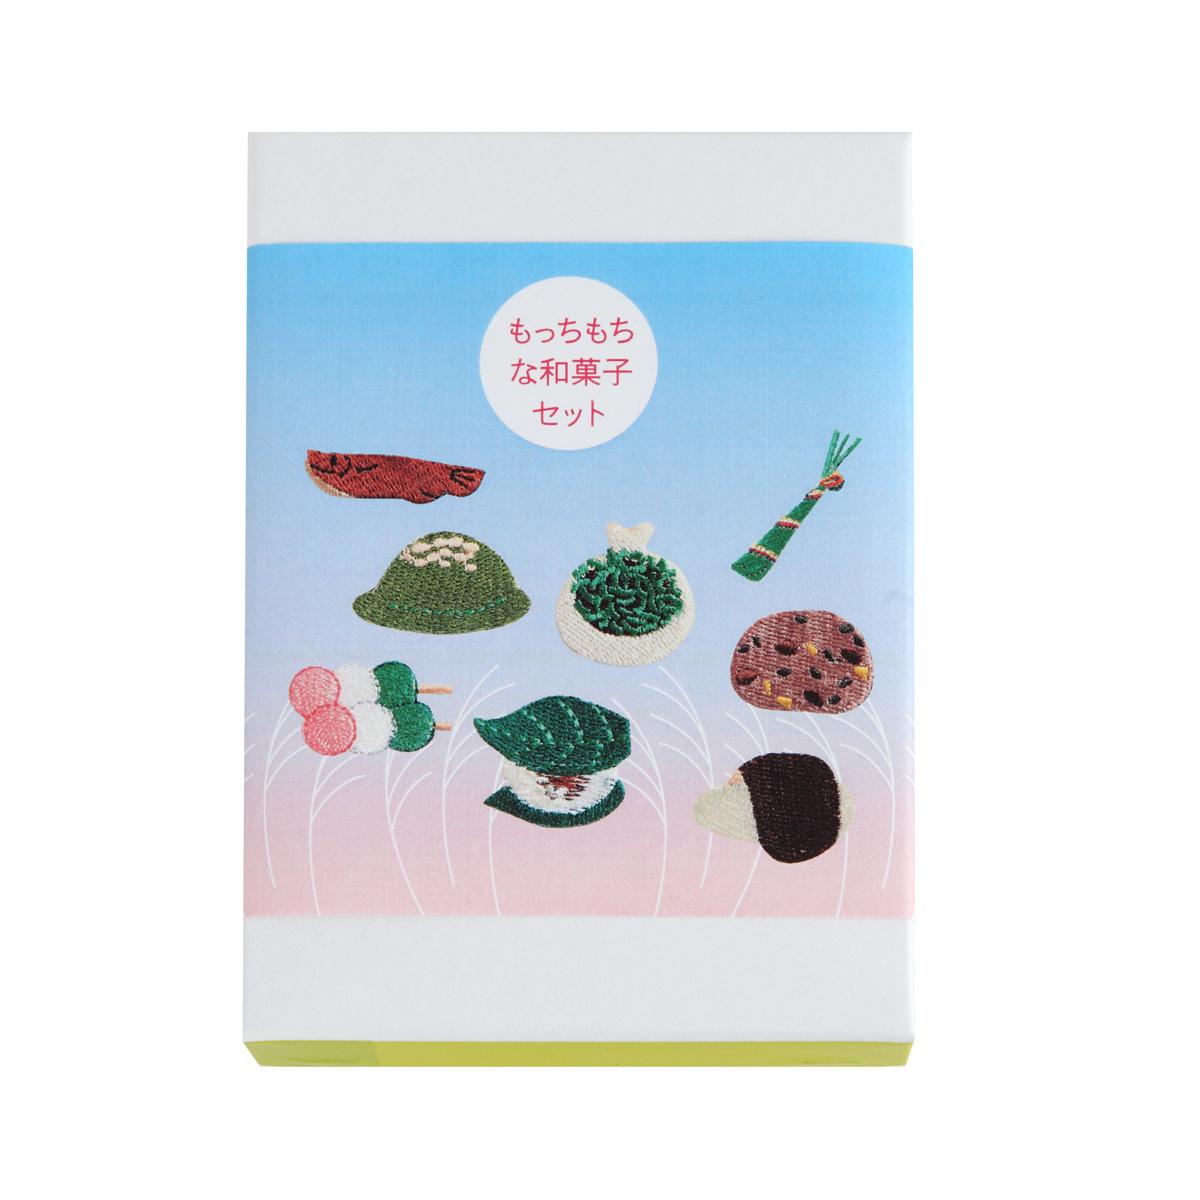 KY58-857B/ワッペンセット/もっちもちな和菓子